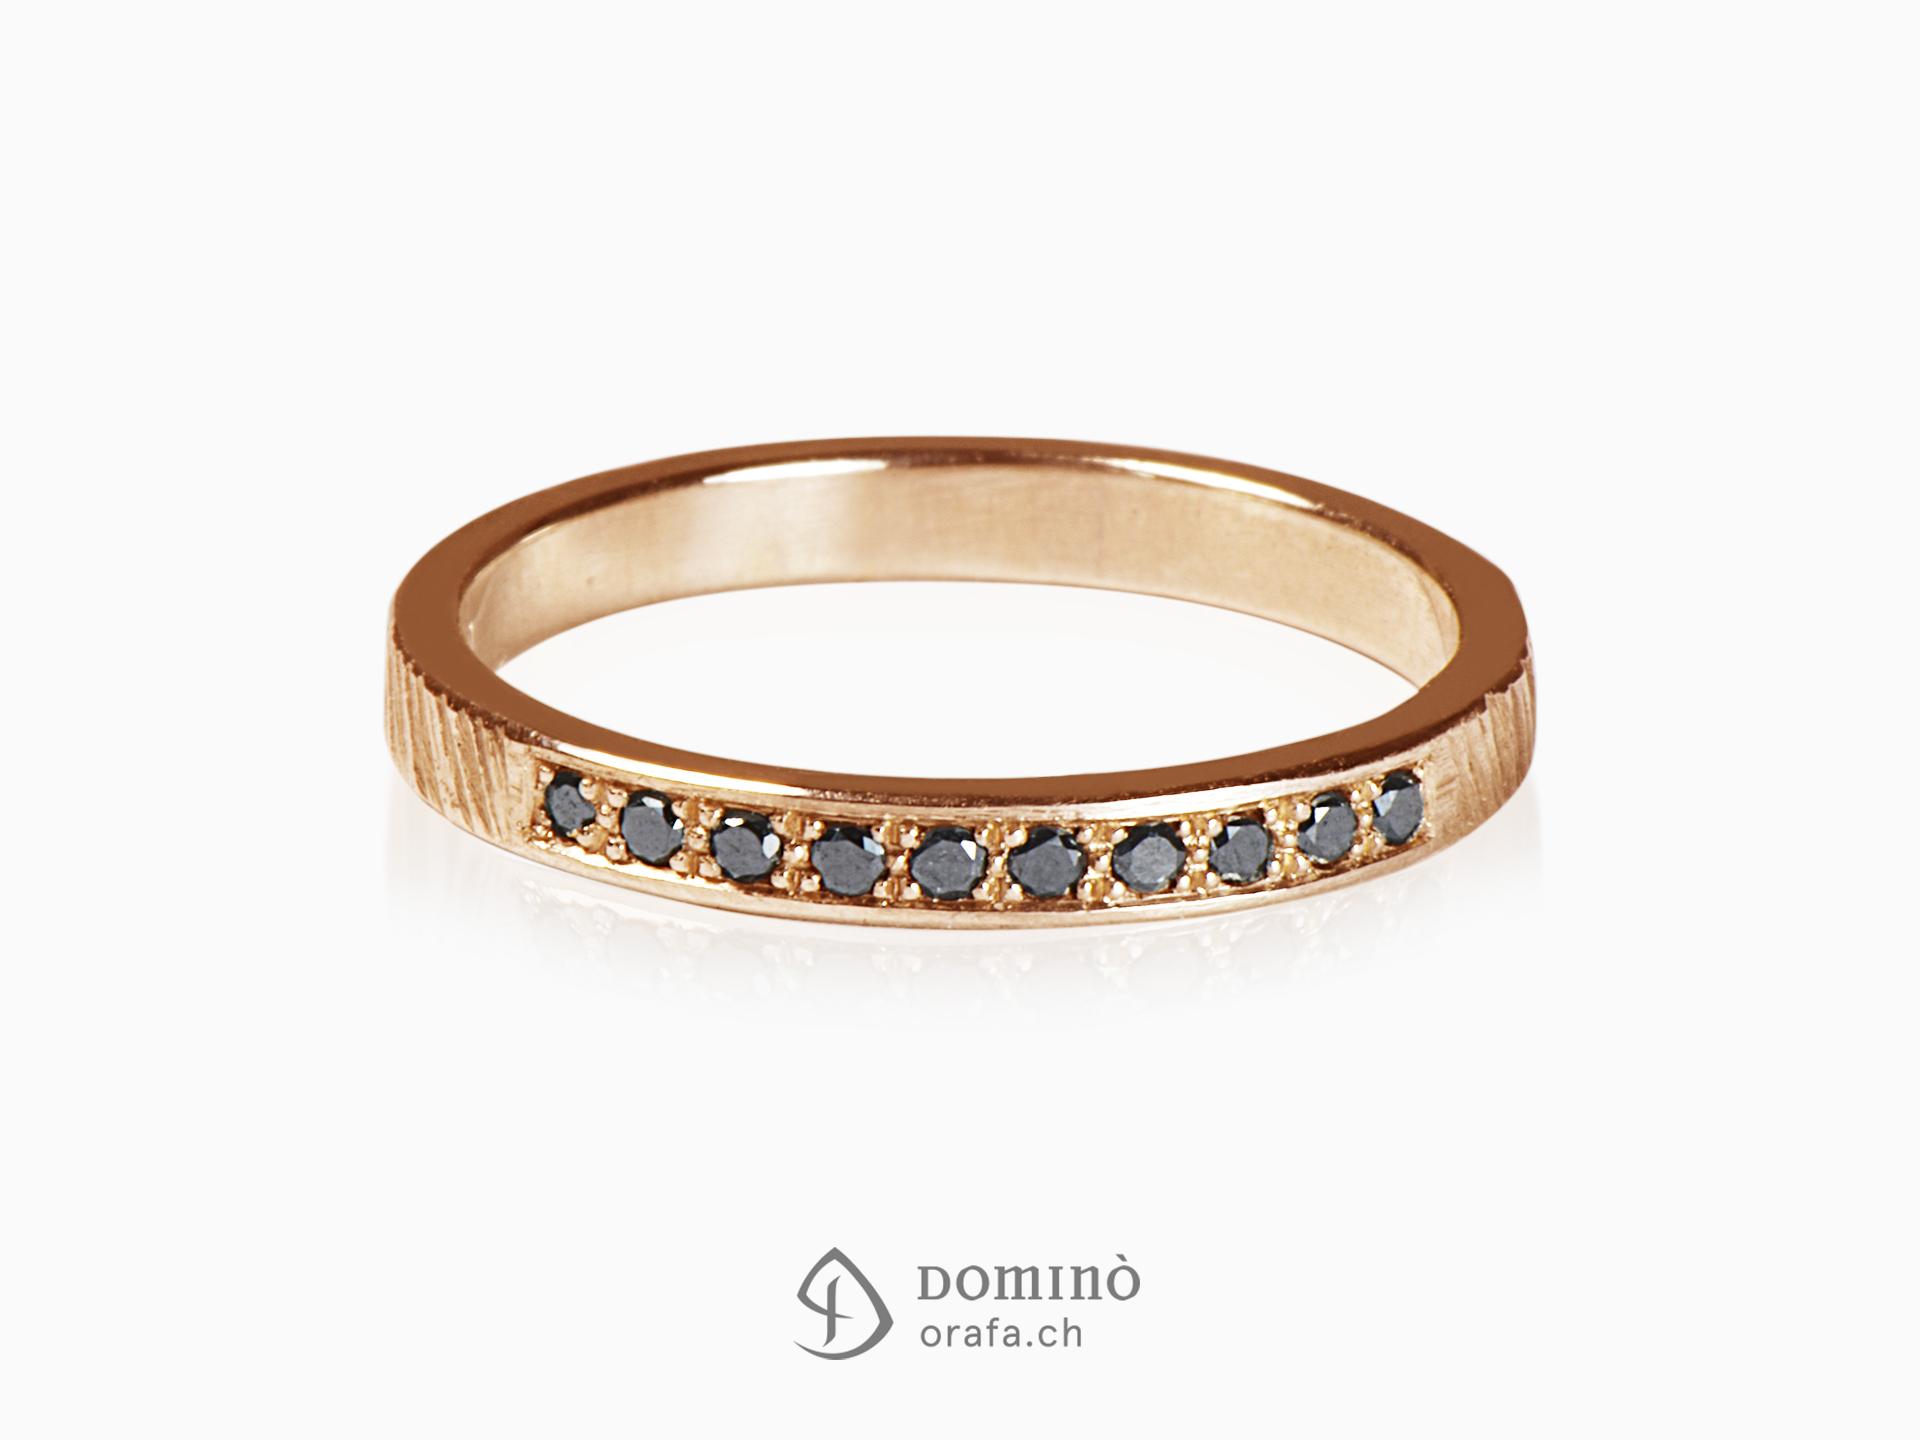 ring with black diamonds